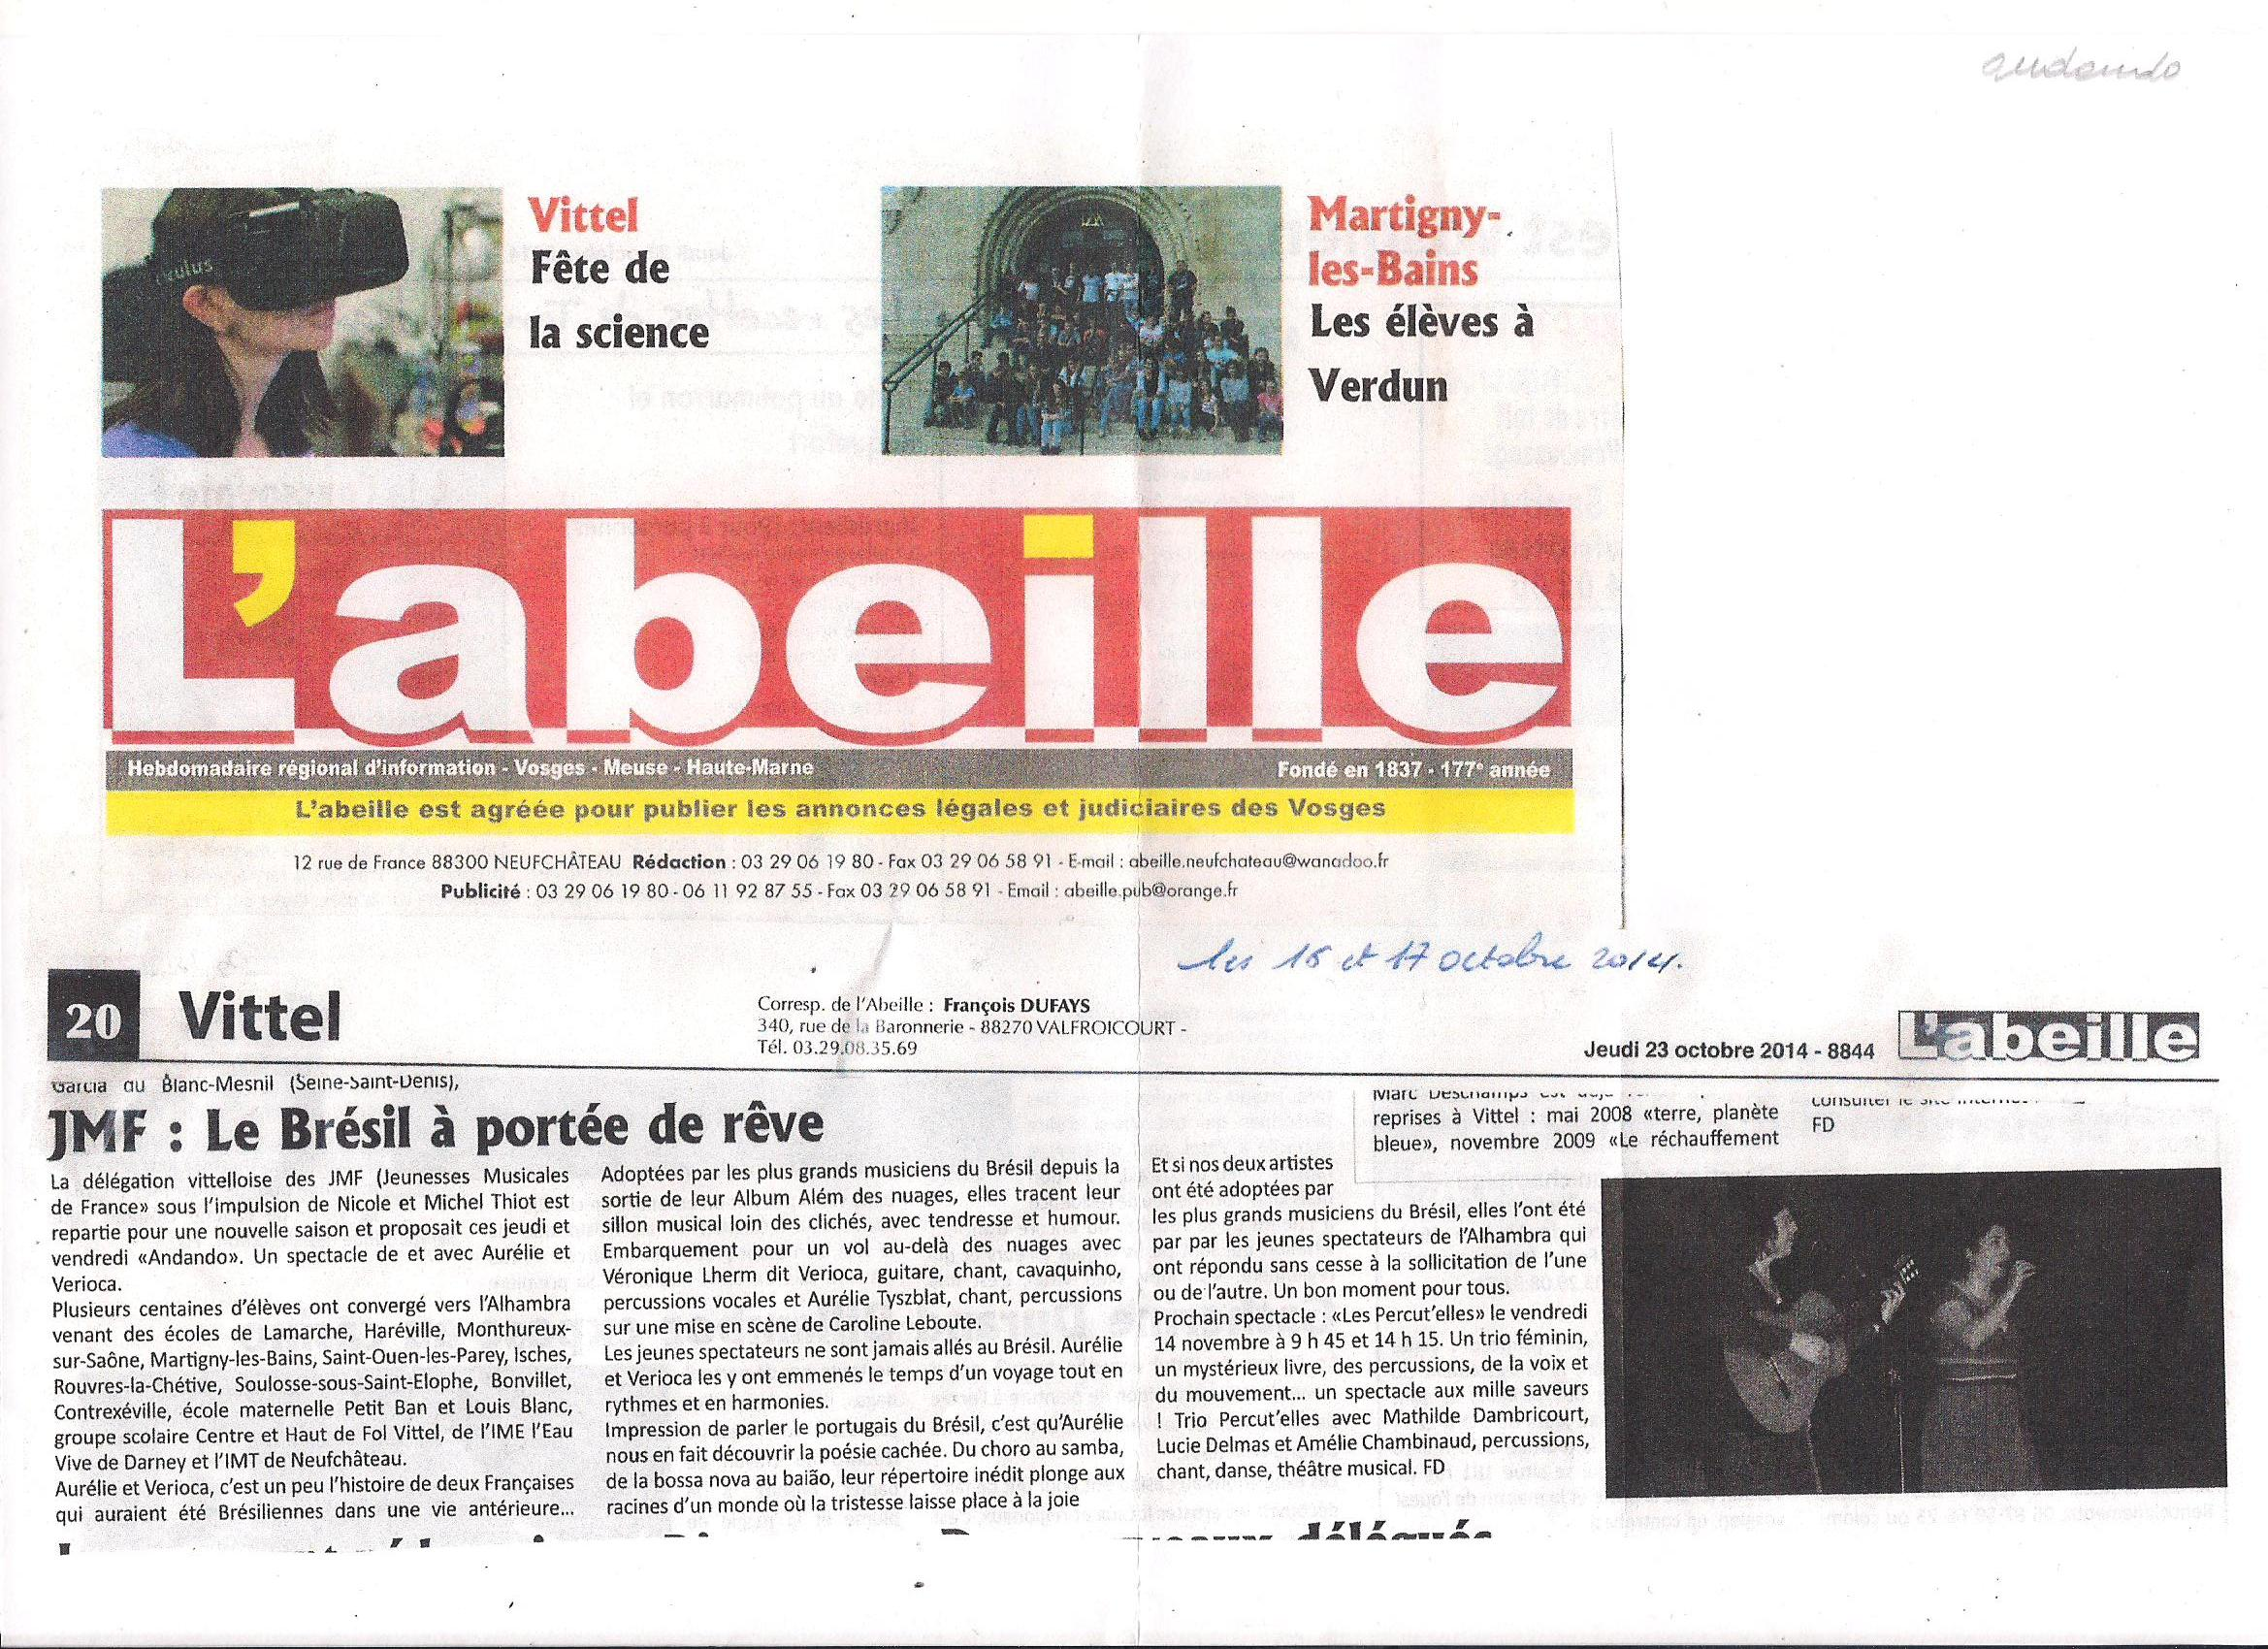 AURELIE VERIOCA_ANDANDO_JMFrance_L'Abeille